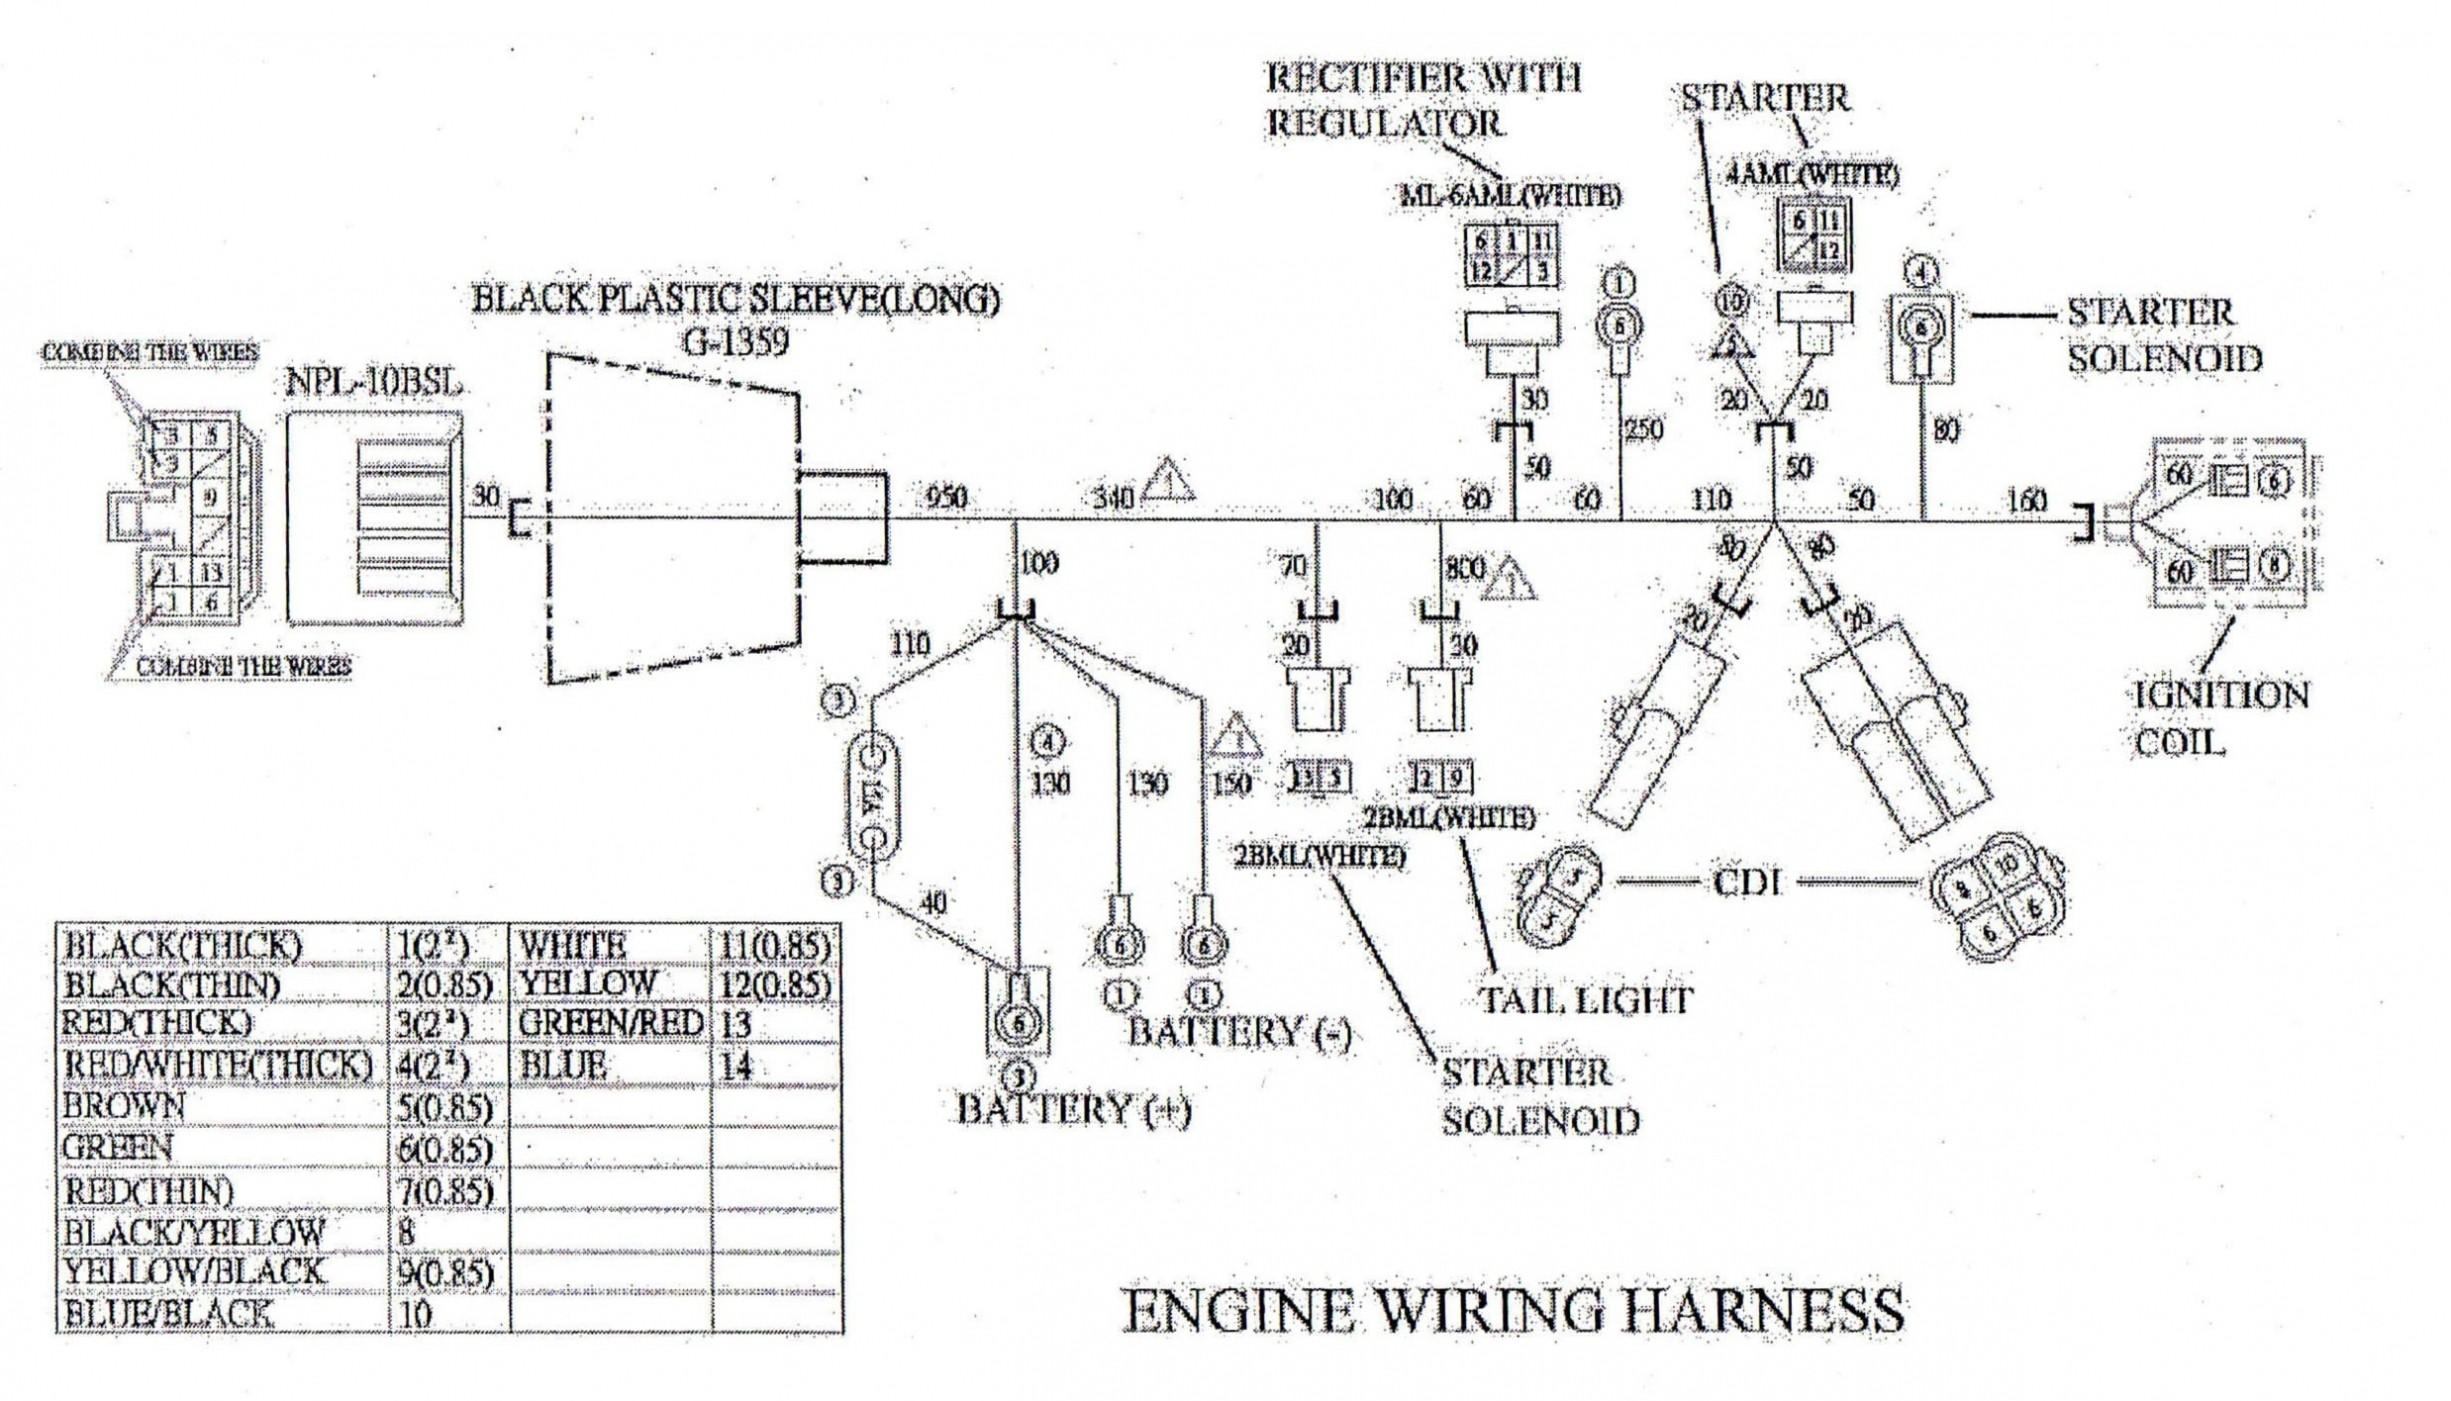 Vipper 4 Wire Diagram Diagram] 99 Ranger Abs Wiring Diagram Full Version Hd Of Vipper 4 Wire Diagram